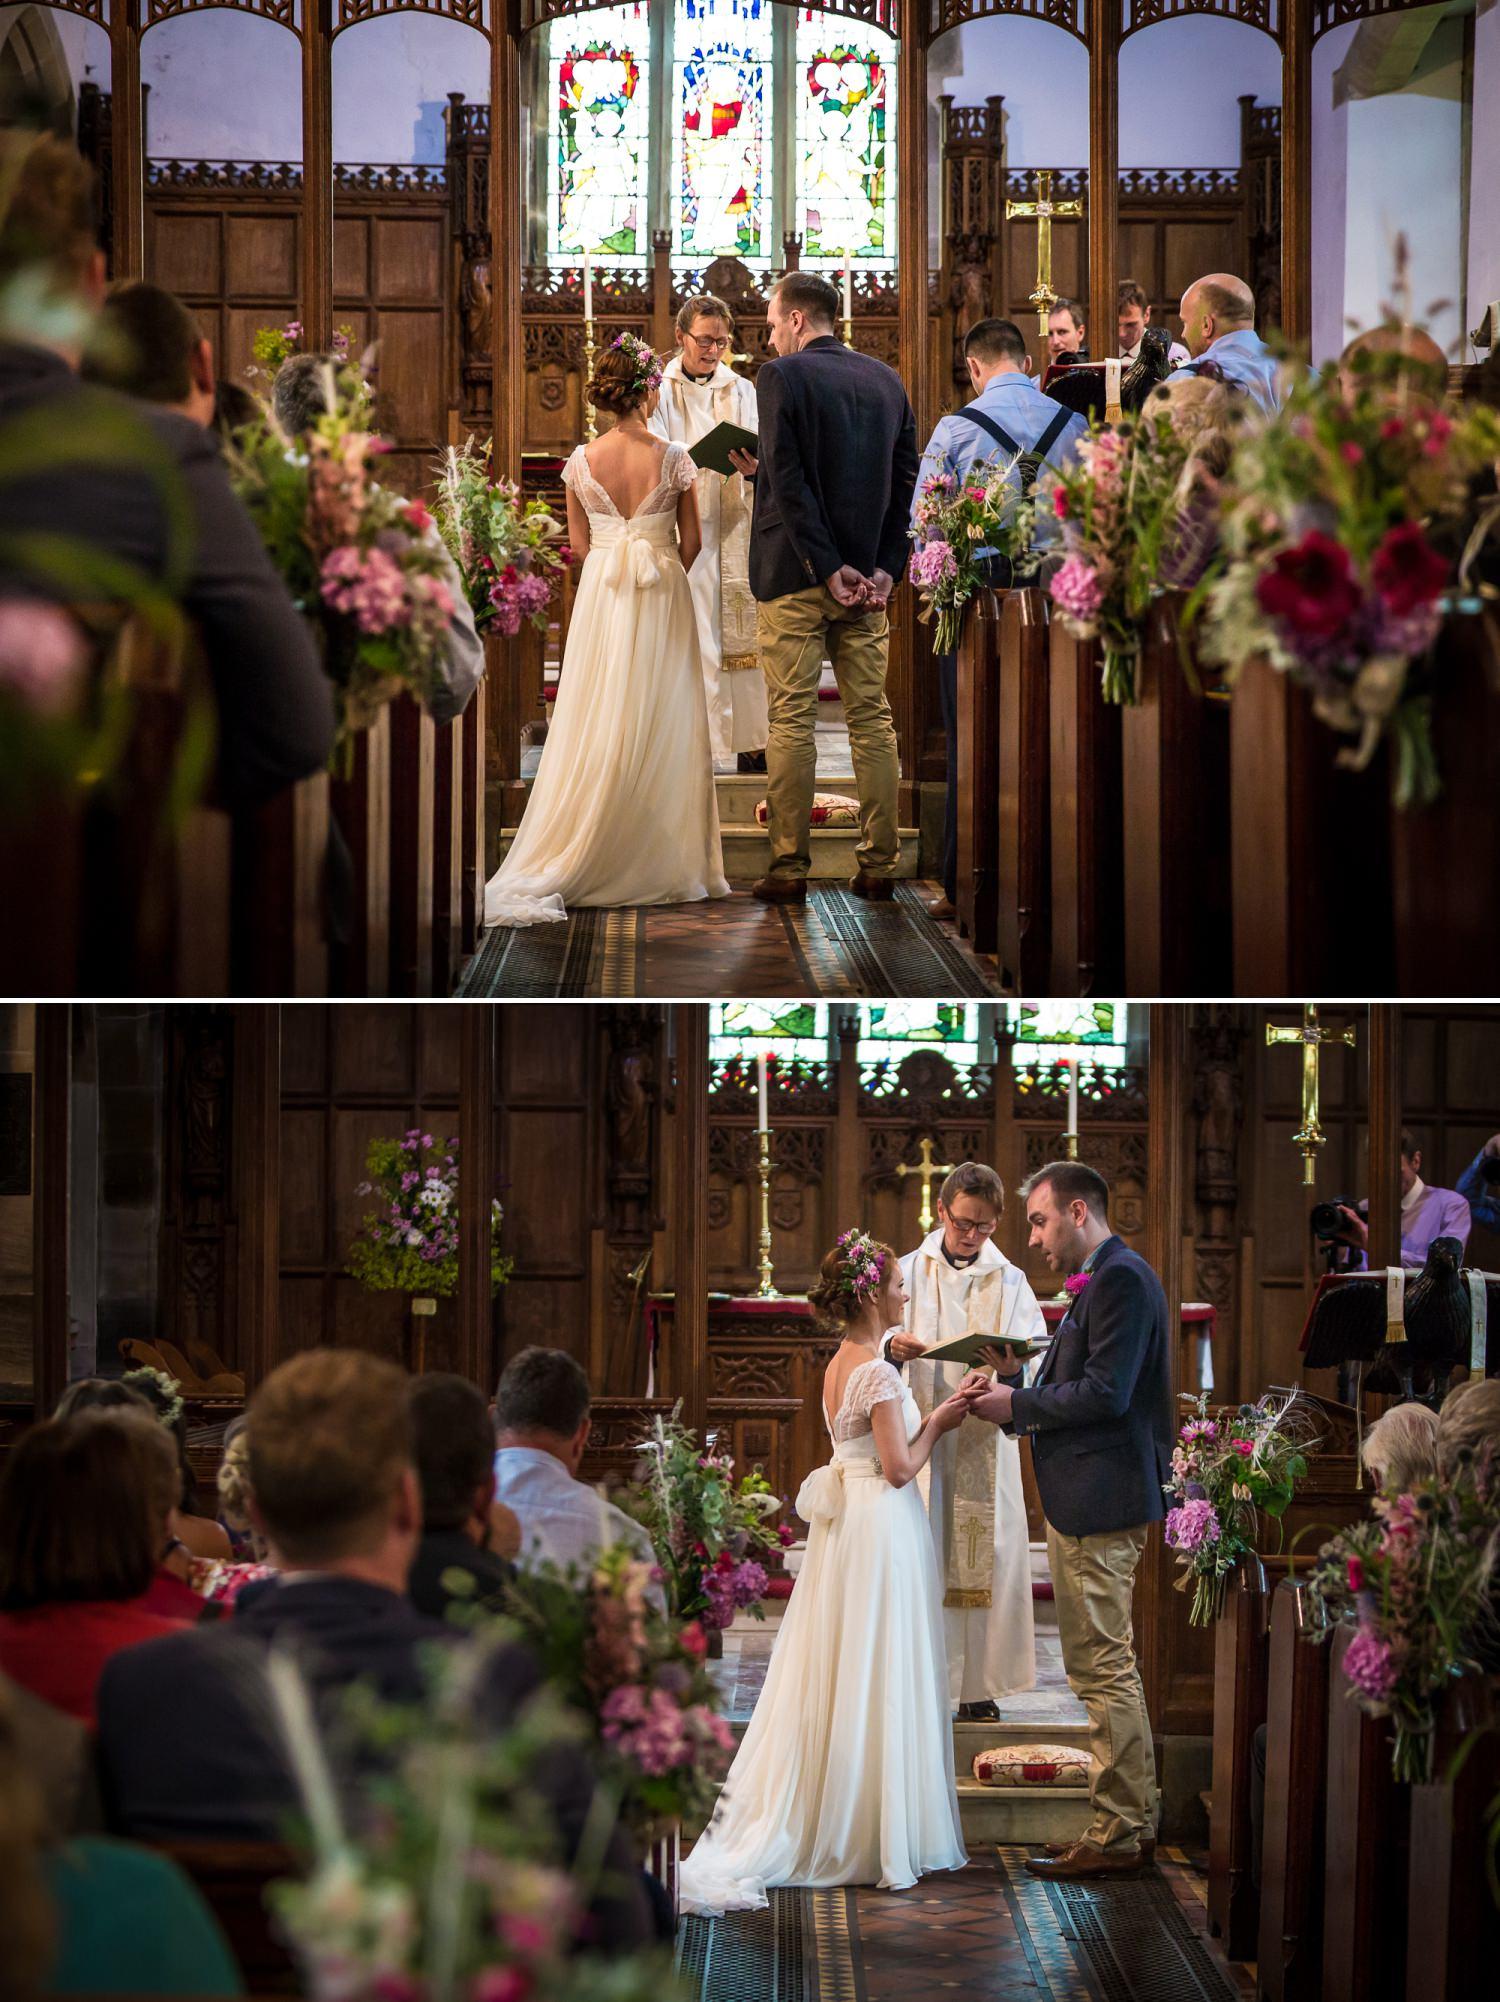 Wedding photographer Plas Isaf